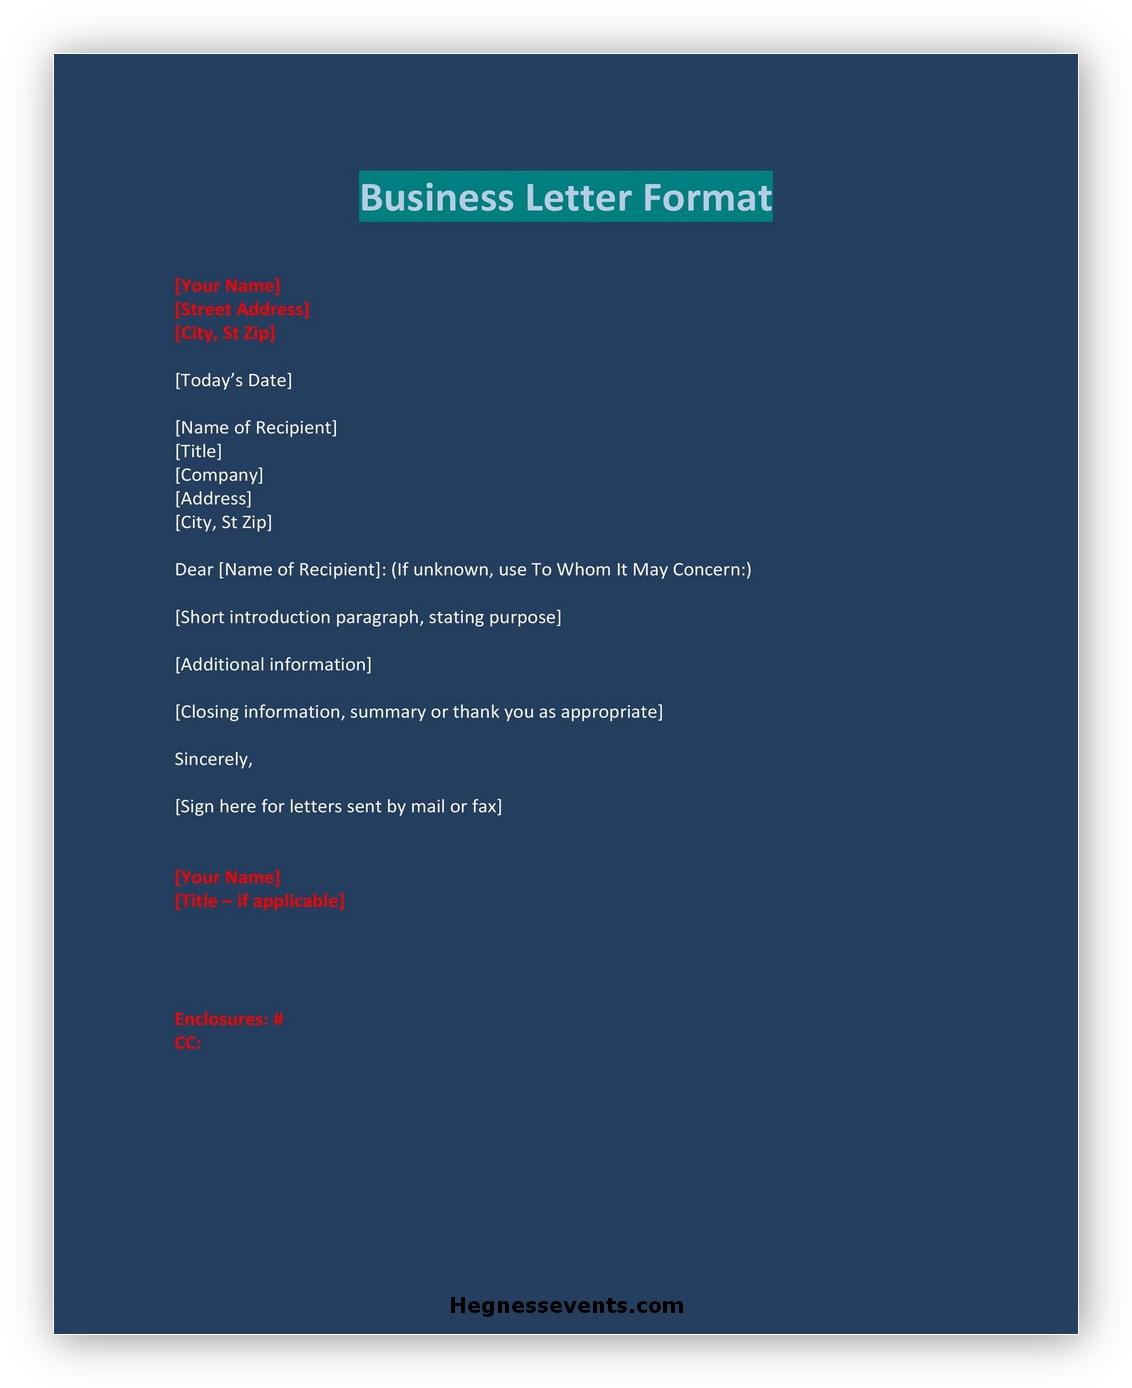 Business letter Format 09